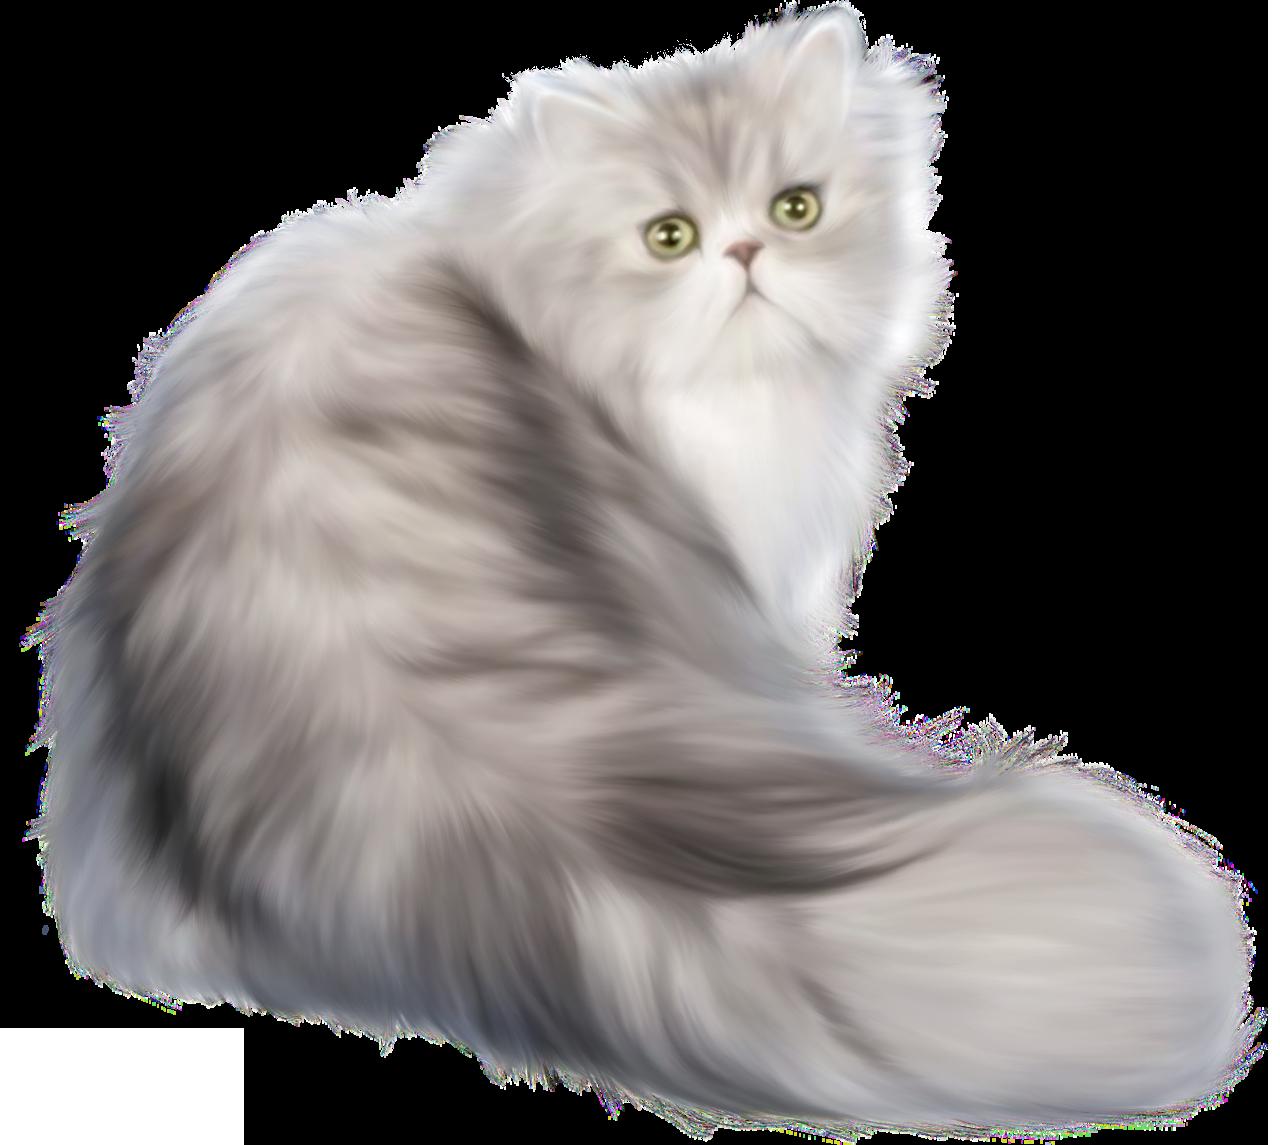 Kittens clipart cate. Cat png clip art